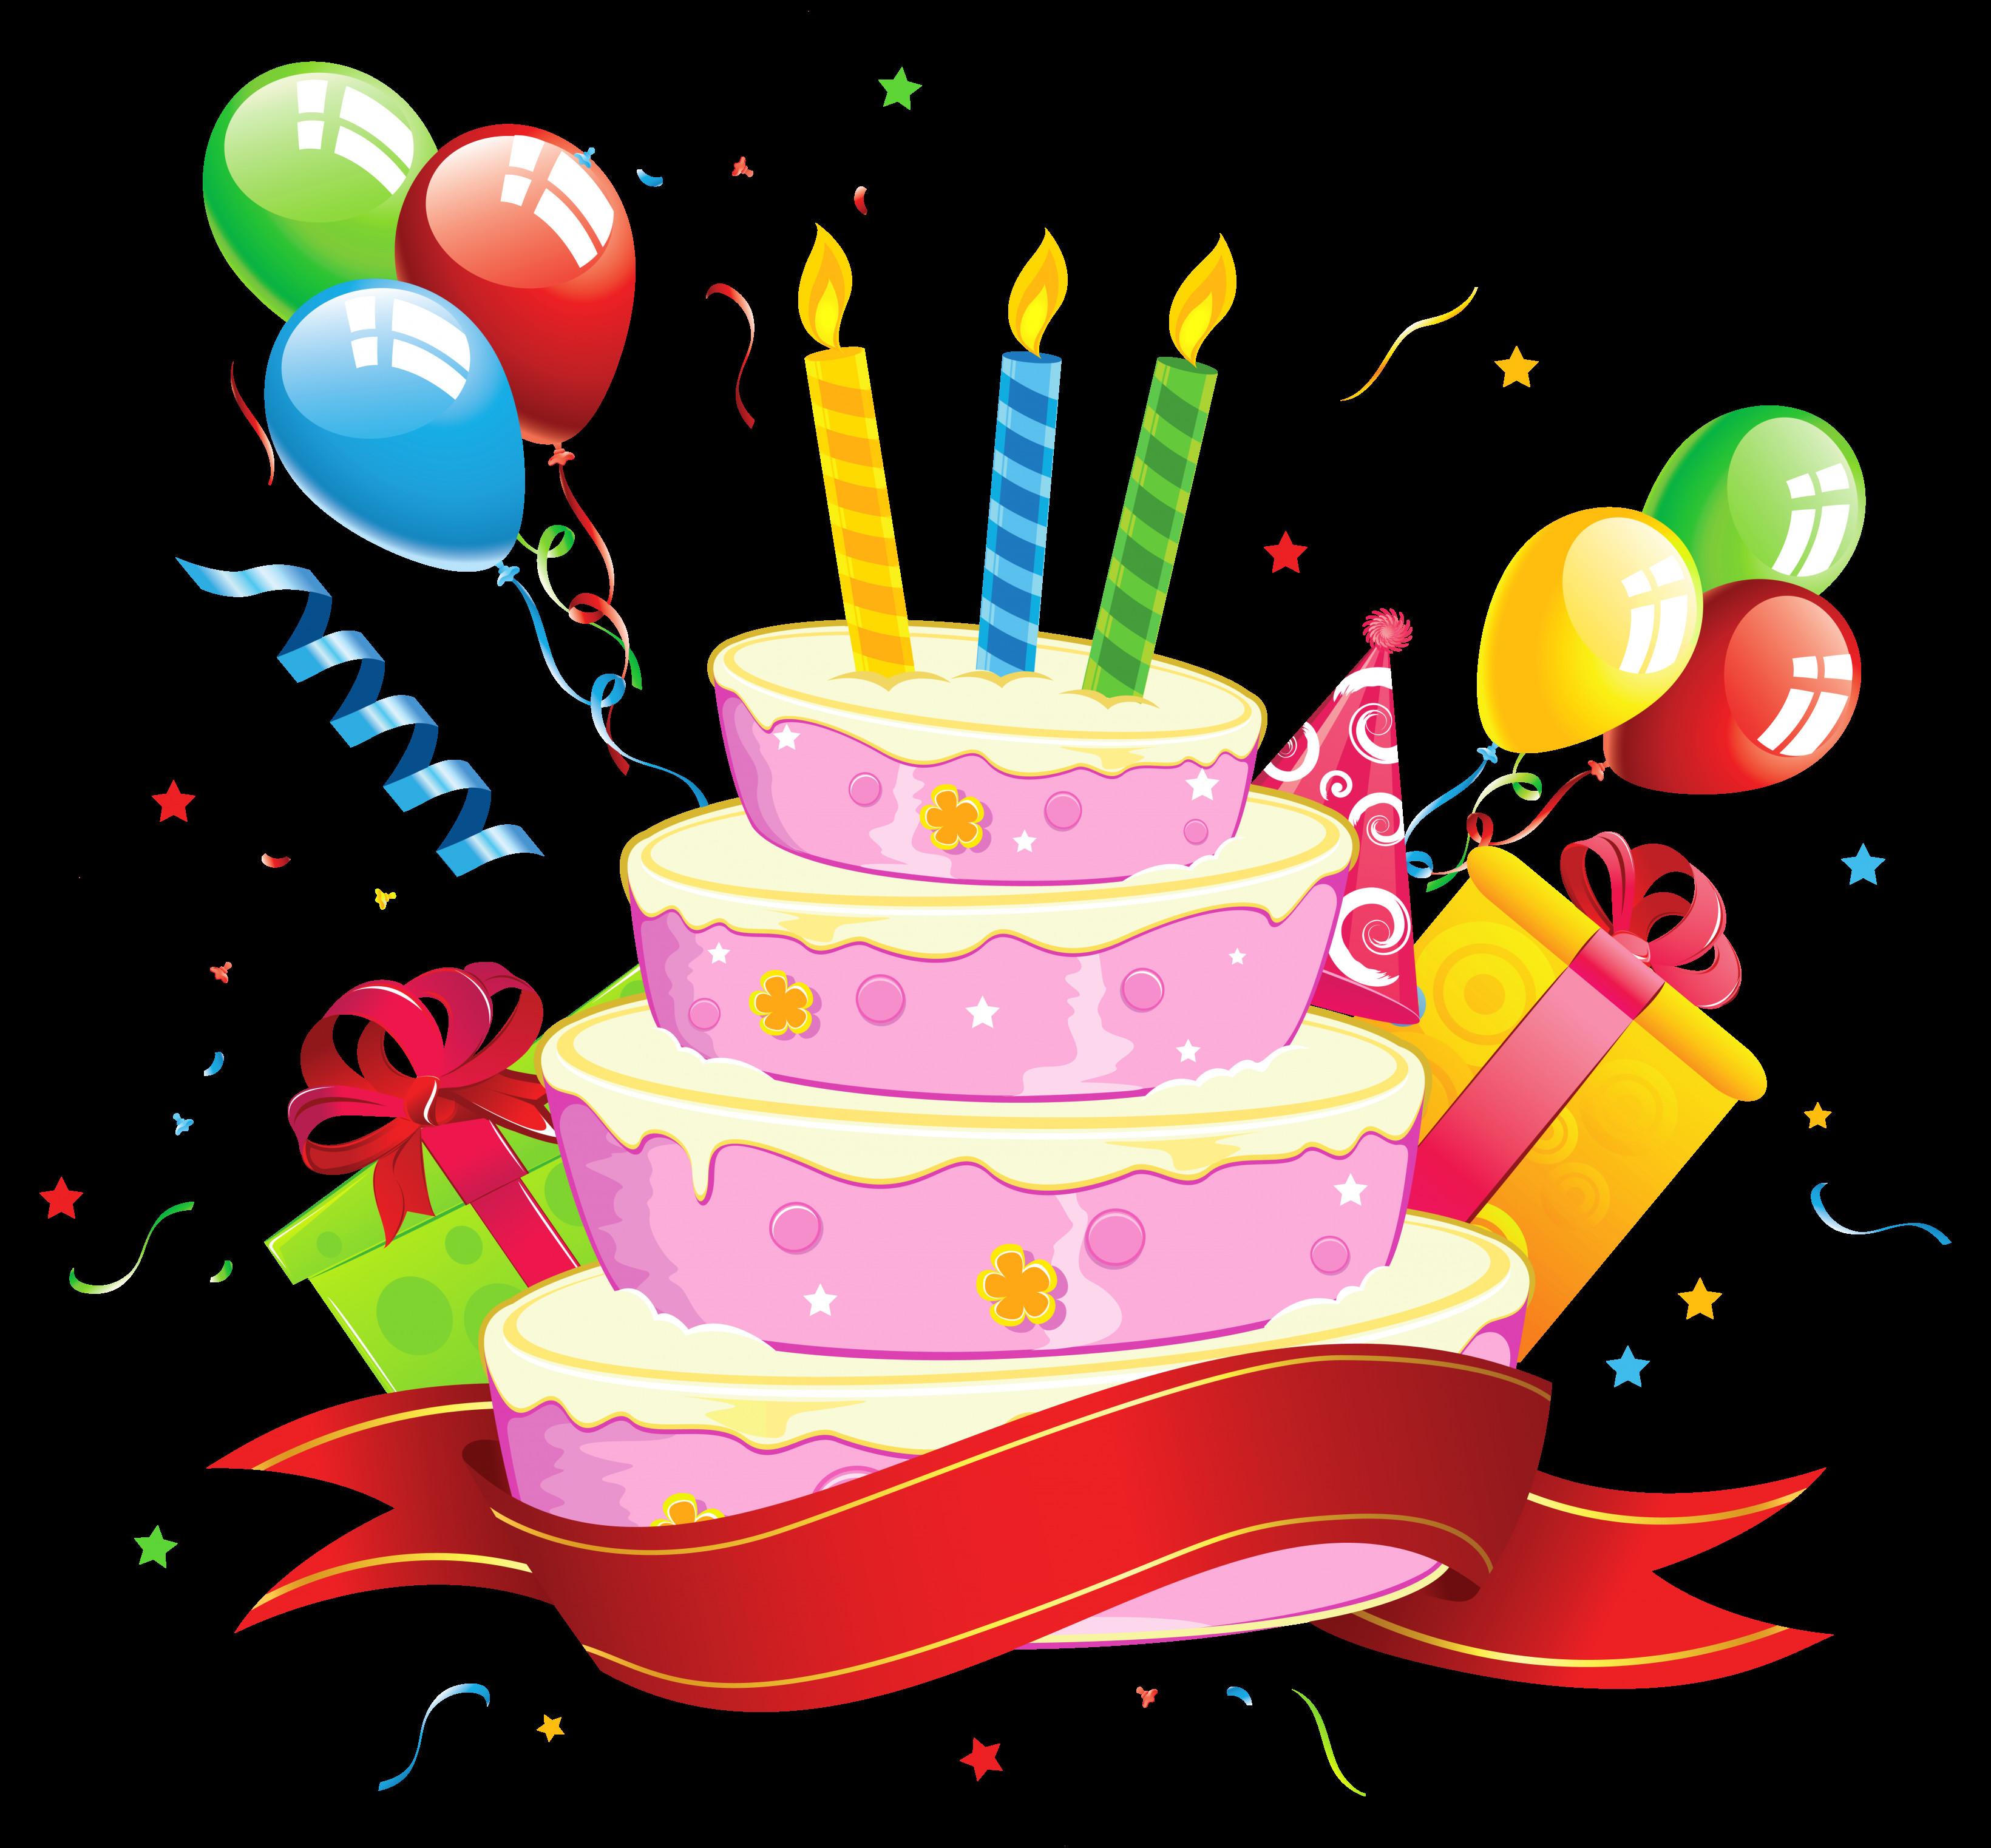 Clipart Birthday Cake Best Of Birthday Cake Clip Art Free Download Clip Art